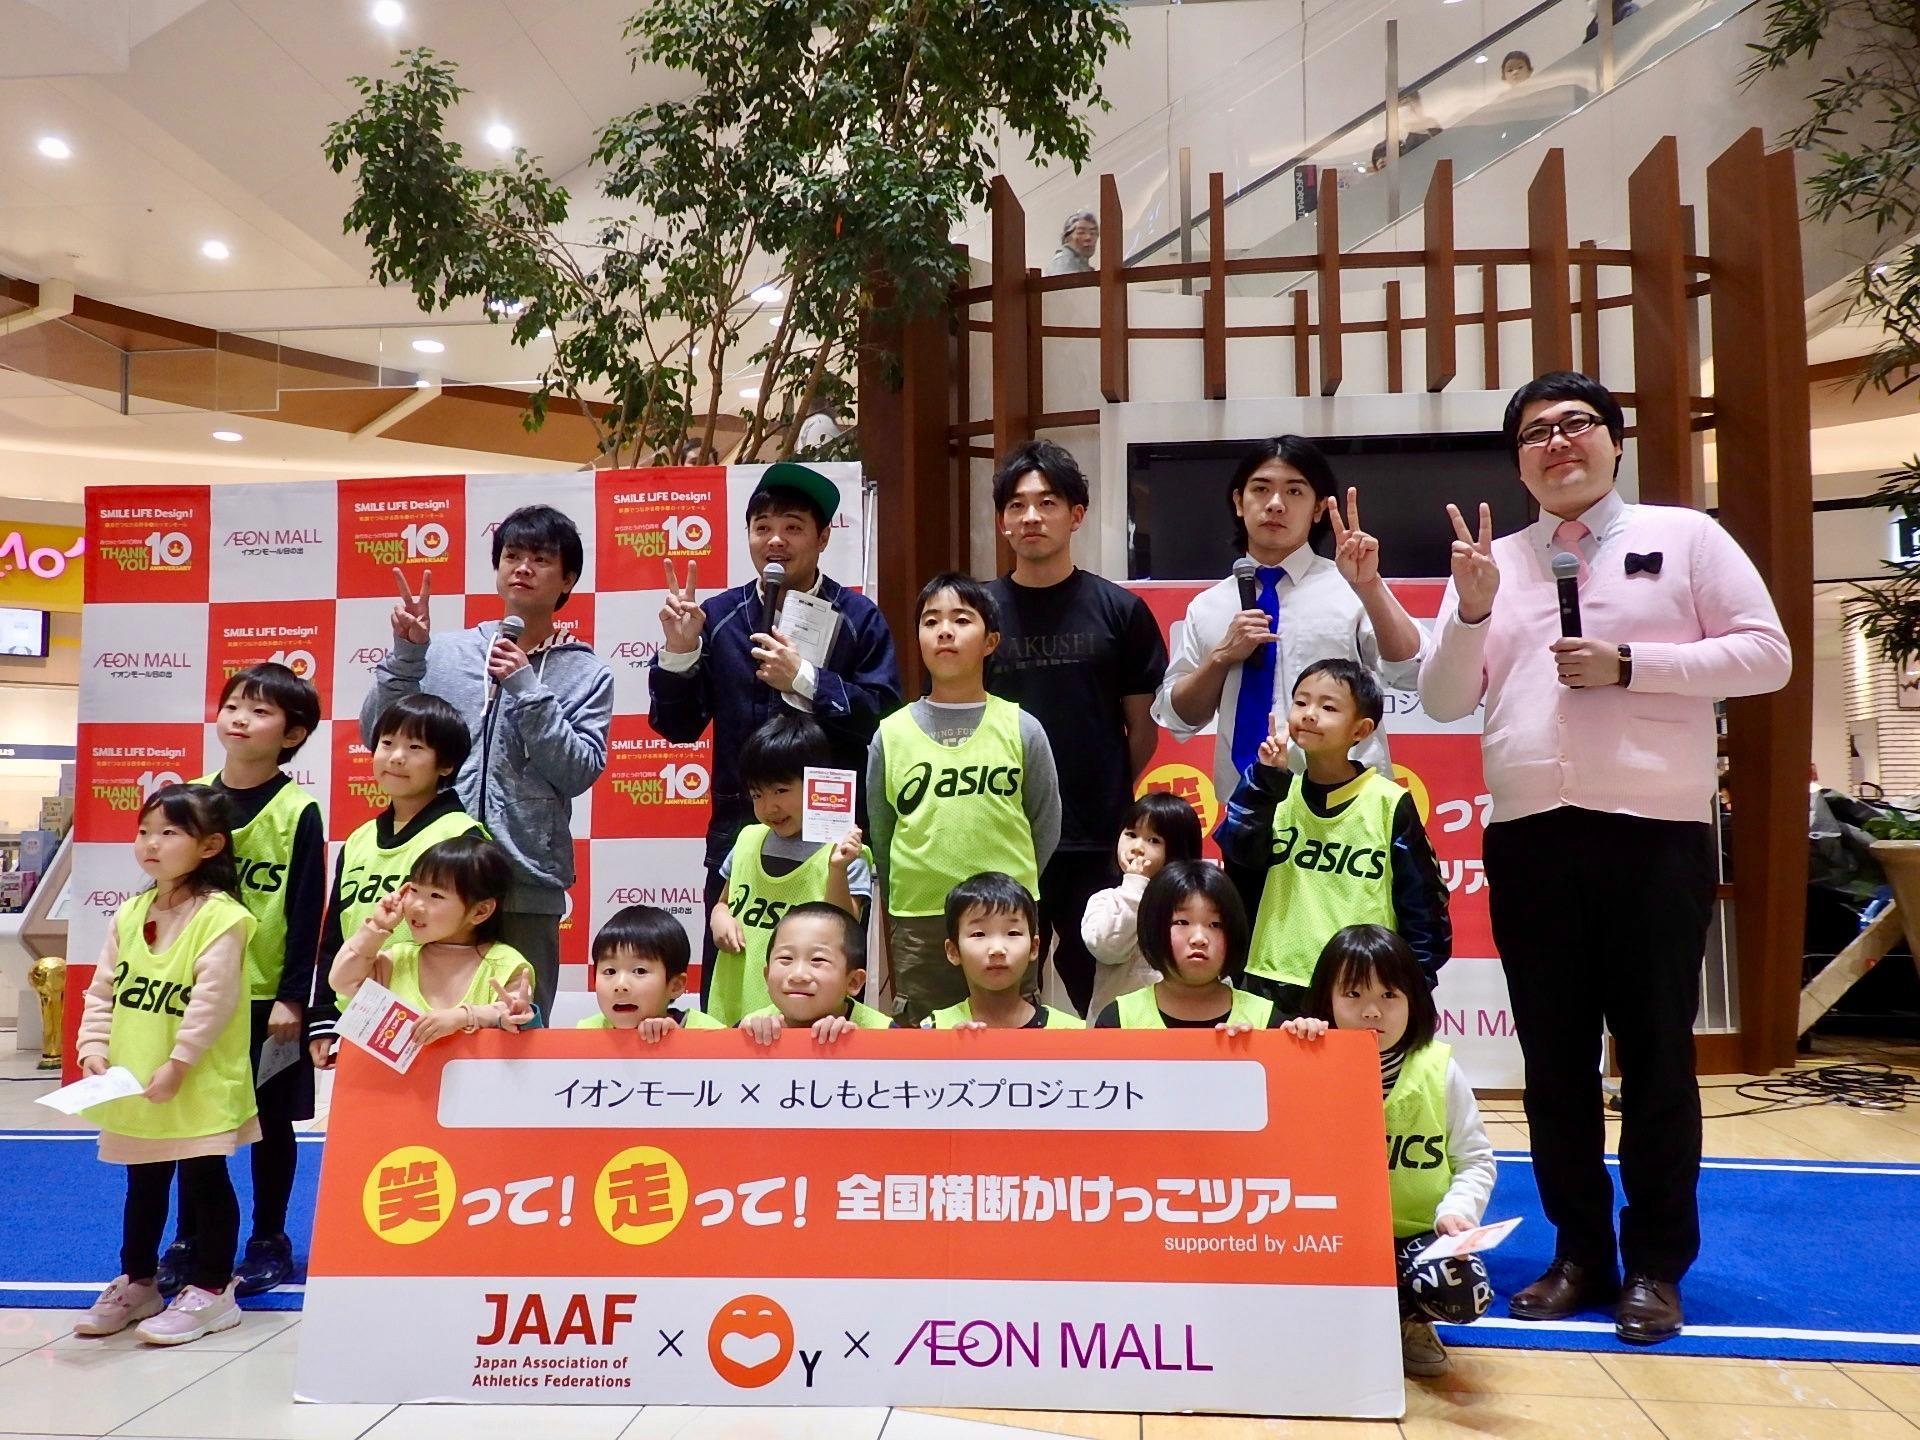 http://news.yoshimoto.co.jp/20180211194311-f811d32ffec01a10793f2584825ead343ce0cdf1.jpg